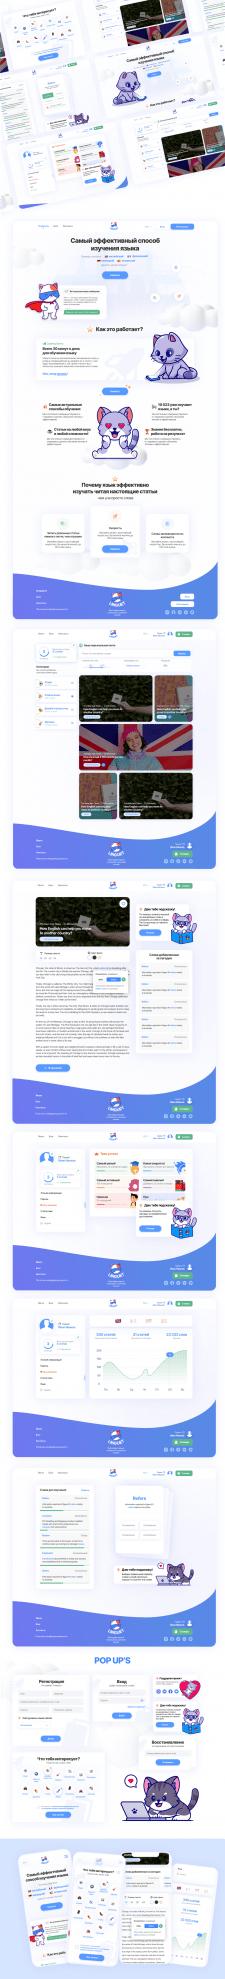 Learning website design